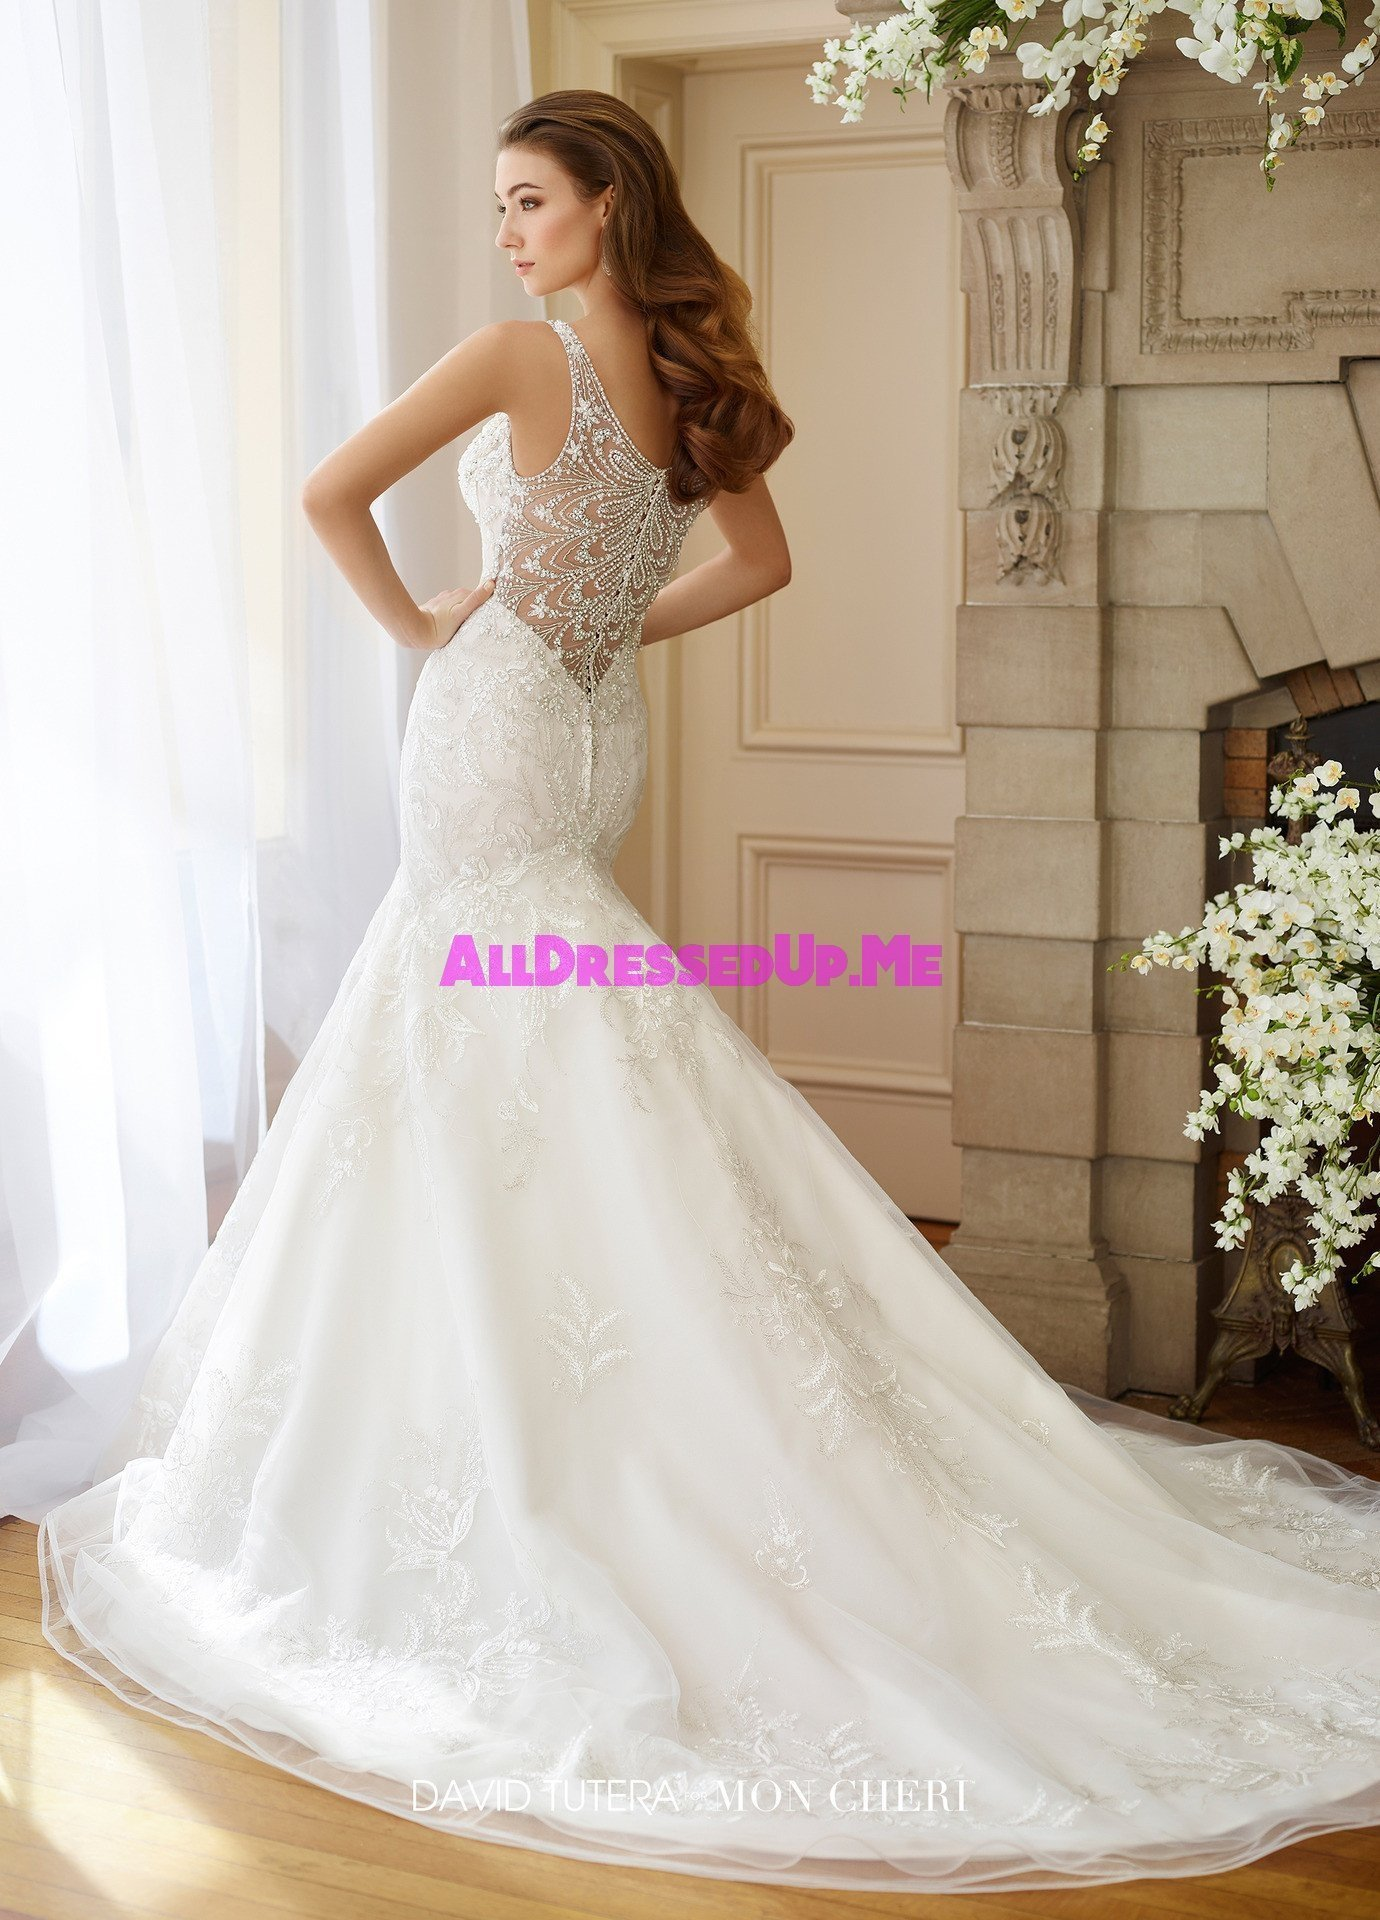 4715919de72b6 David Tutera - 217208W - Bess - All Dressed Up, Bridal Gown - Mon Cheri - -  Wedding Gowns Dresses Chattanooga Hixson Shops Boutiques Tennessee TN  Georgia GA ...